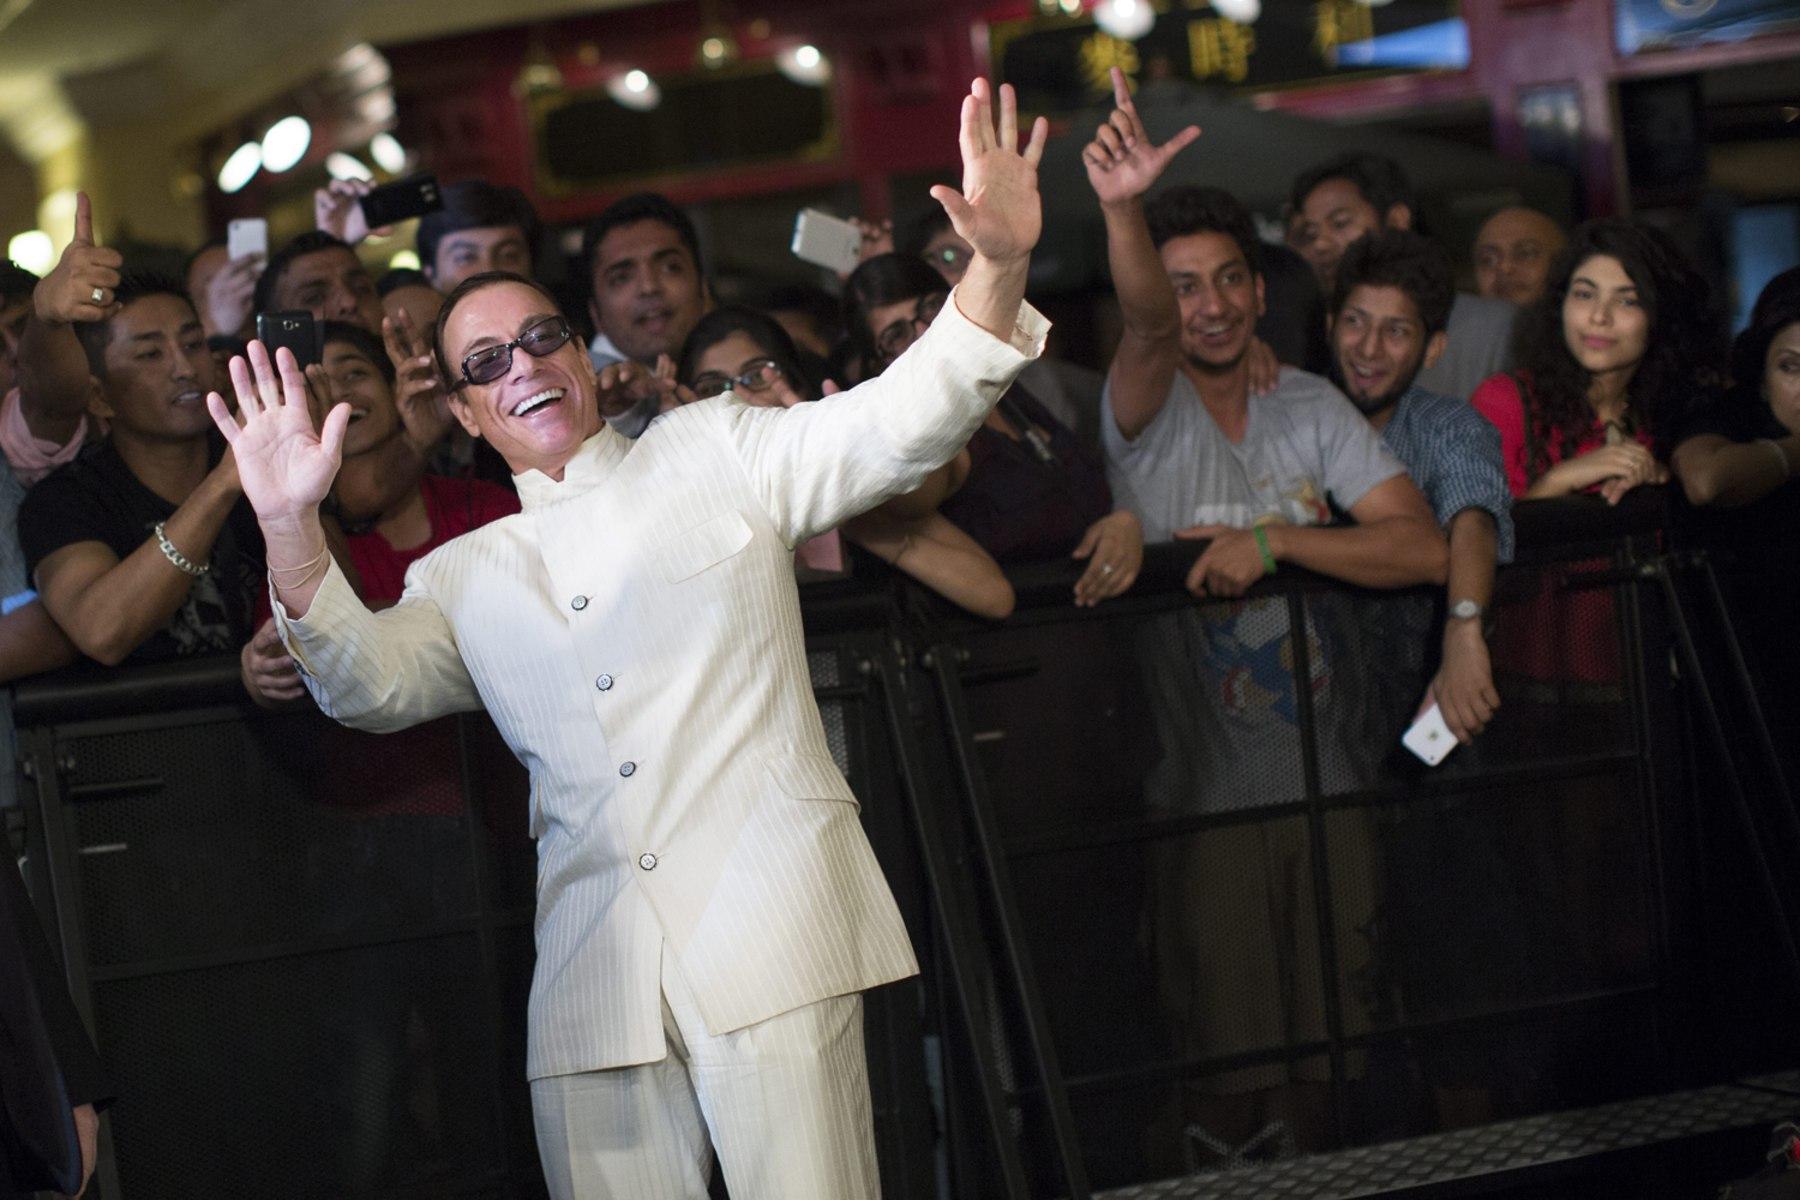 The 10 Best Celebrity Hangouts in Vegas | BestofVegas.com